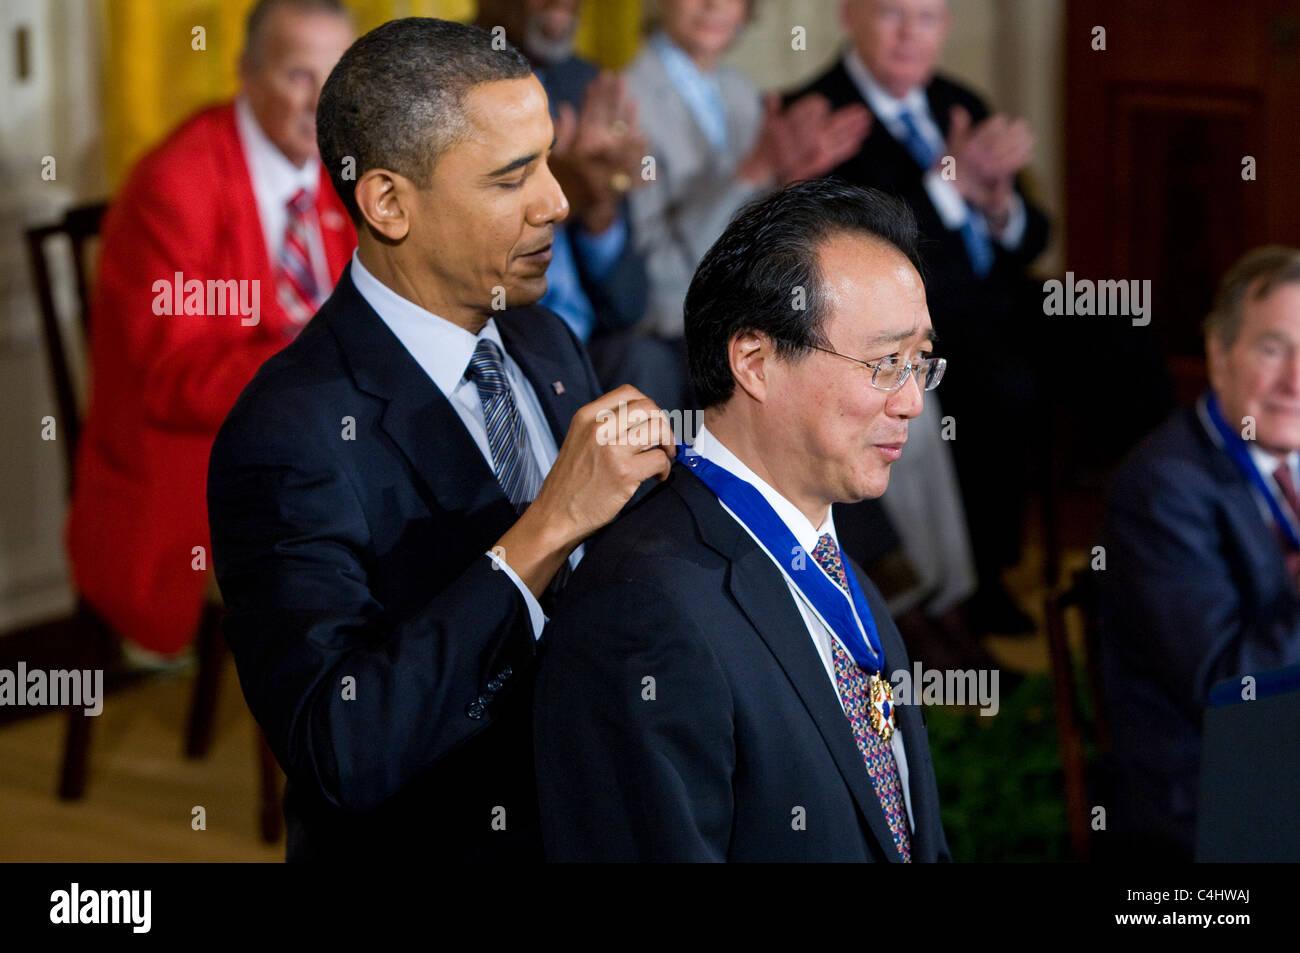 President Barack Obama presents the Presidential Medal of Freedom to Yo-Yo Ma. Stock Photo